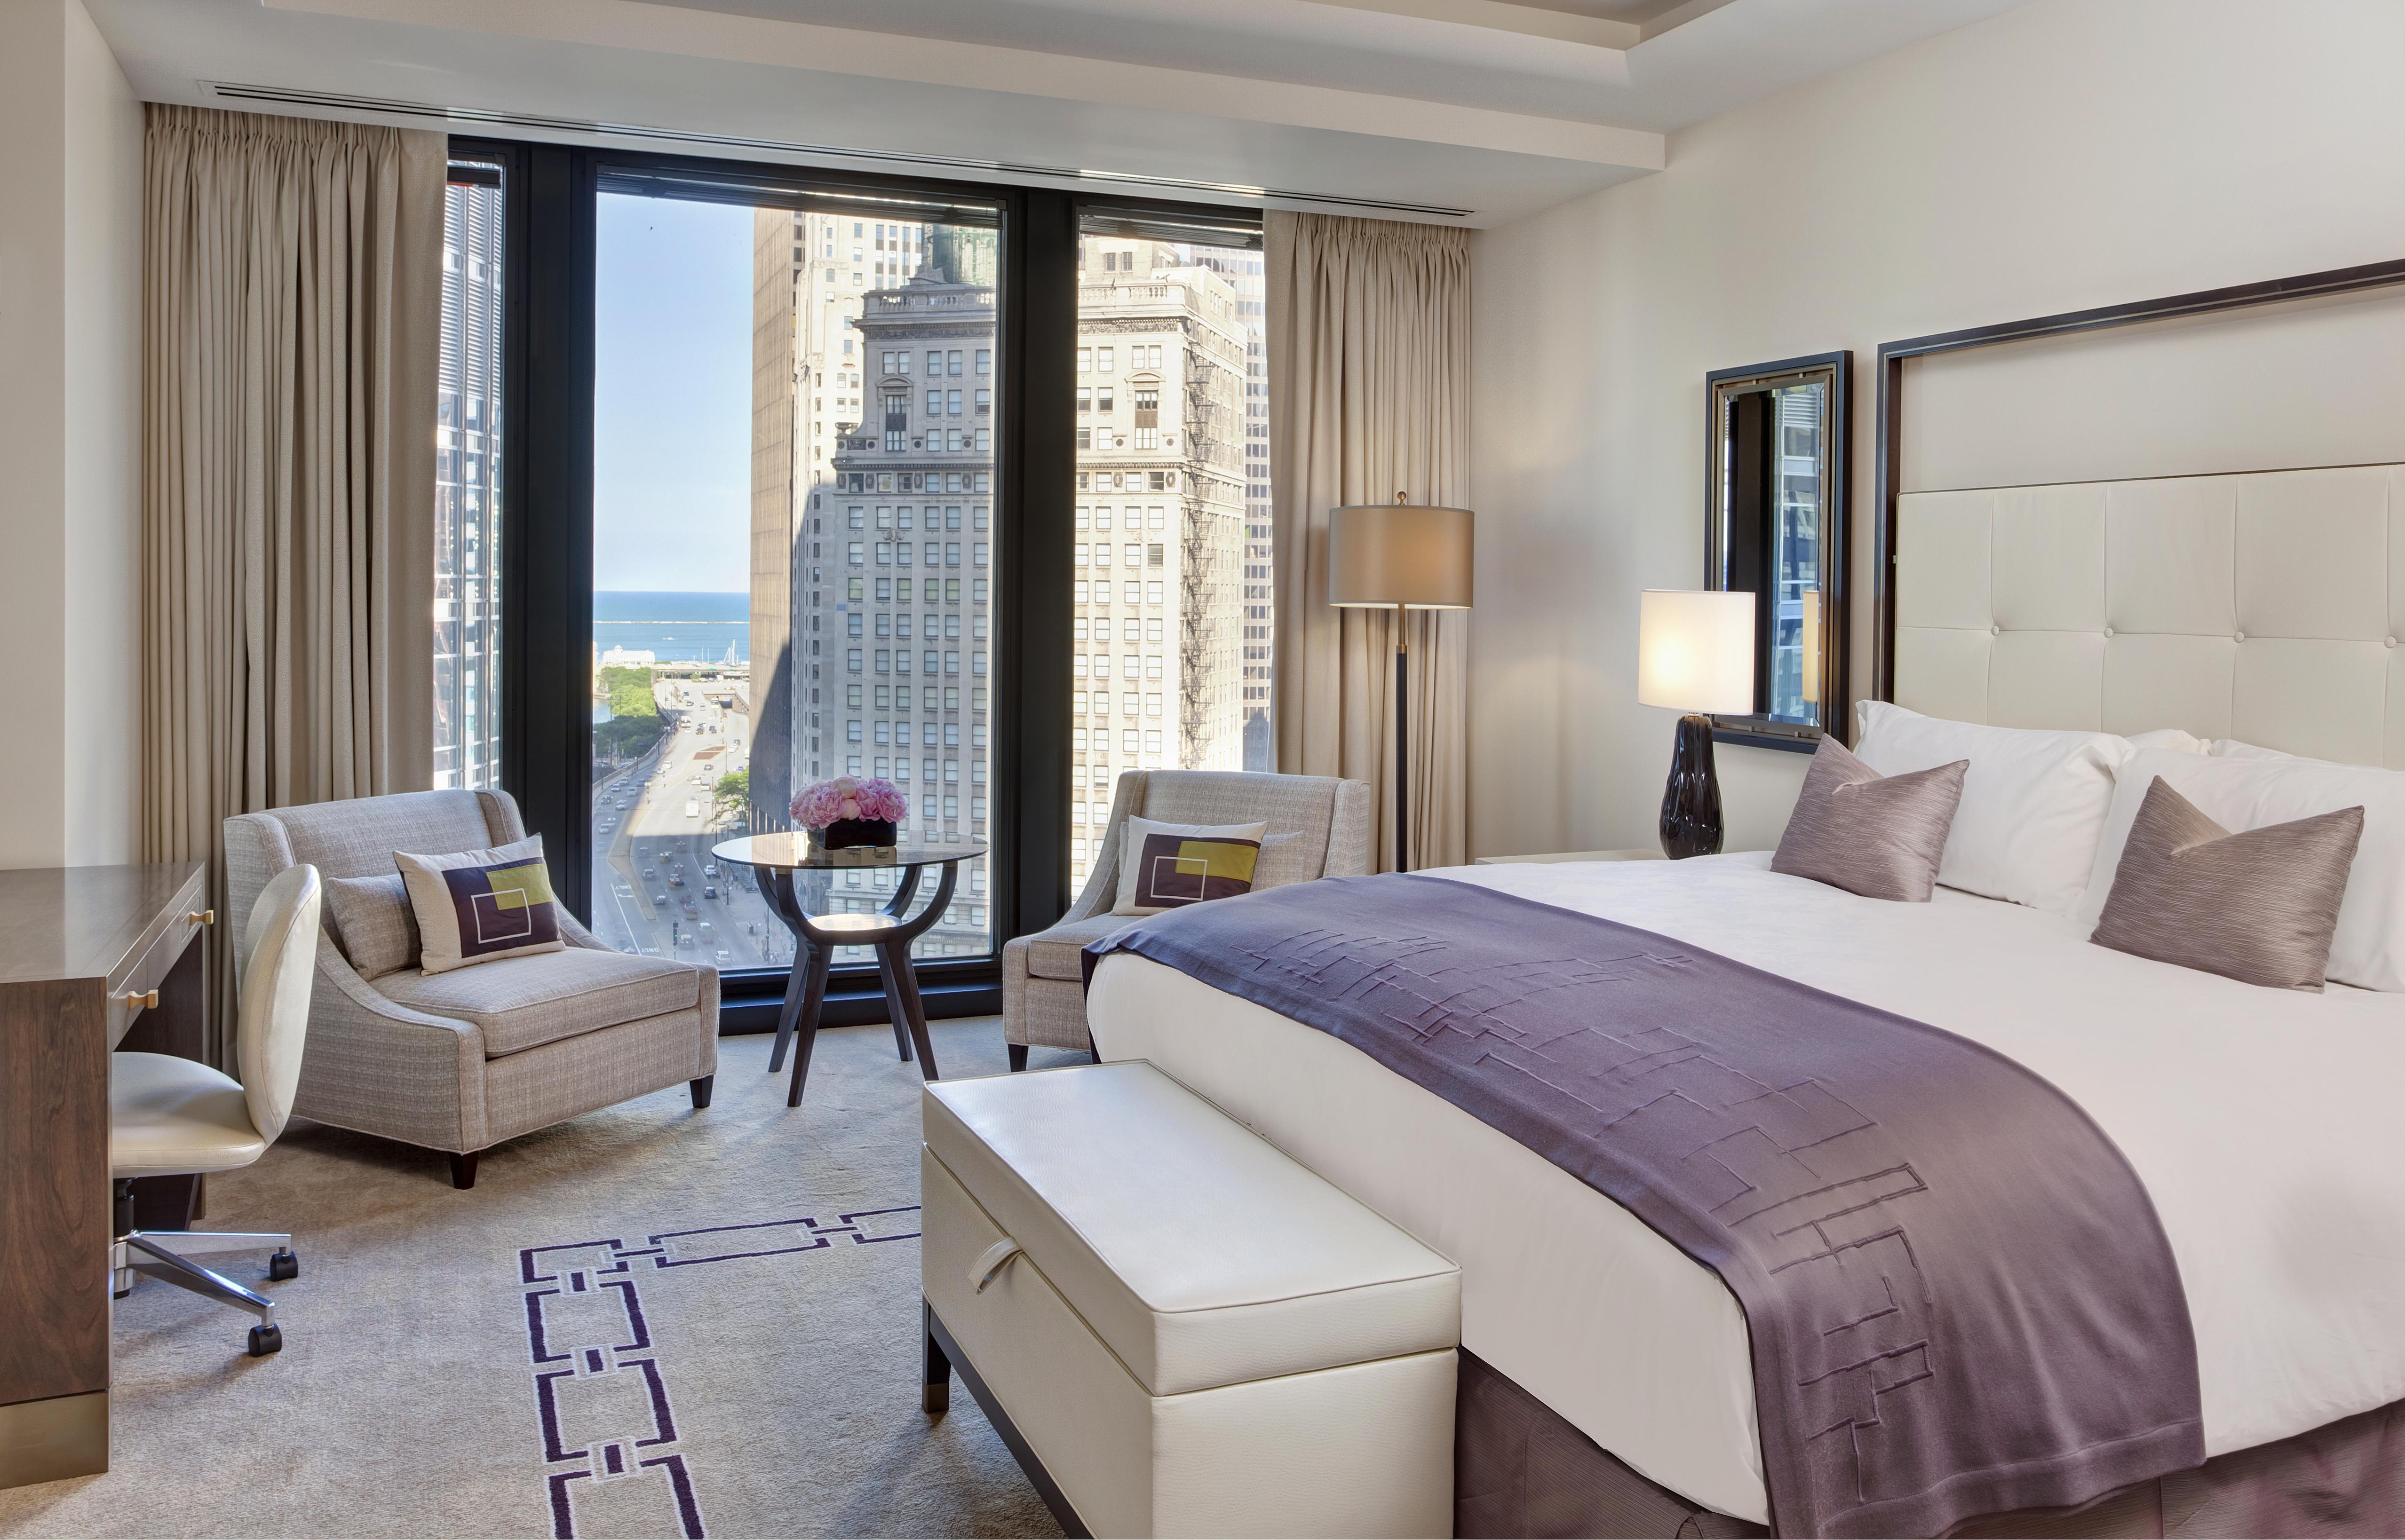 10 of the world's best hotels   CNN Travel